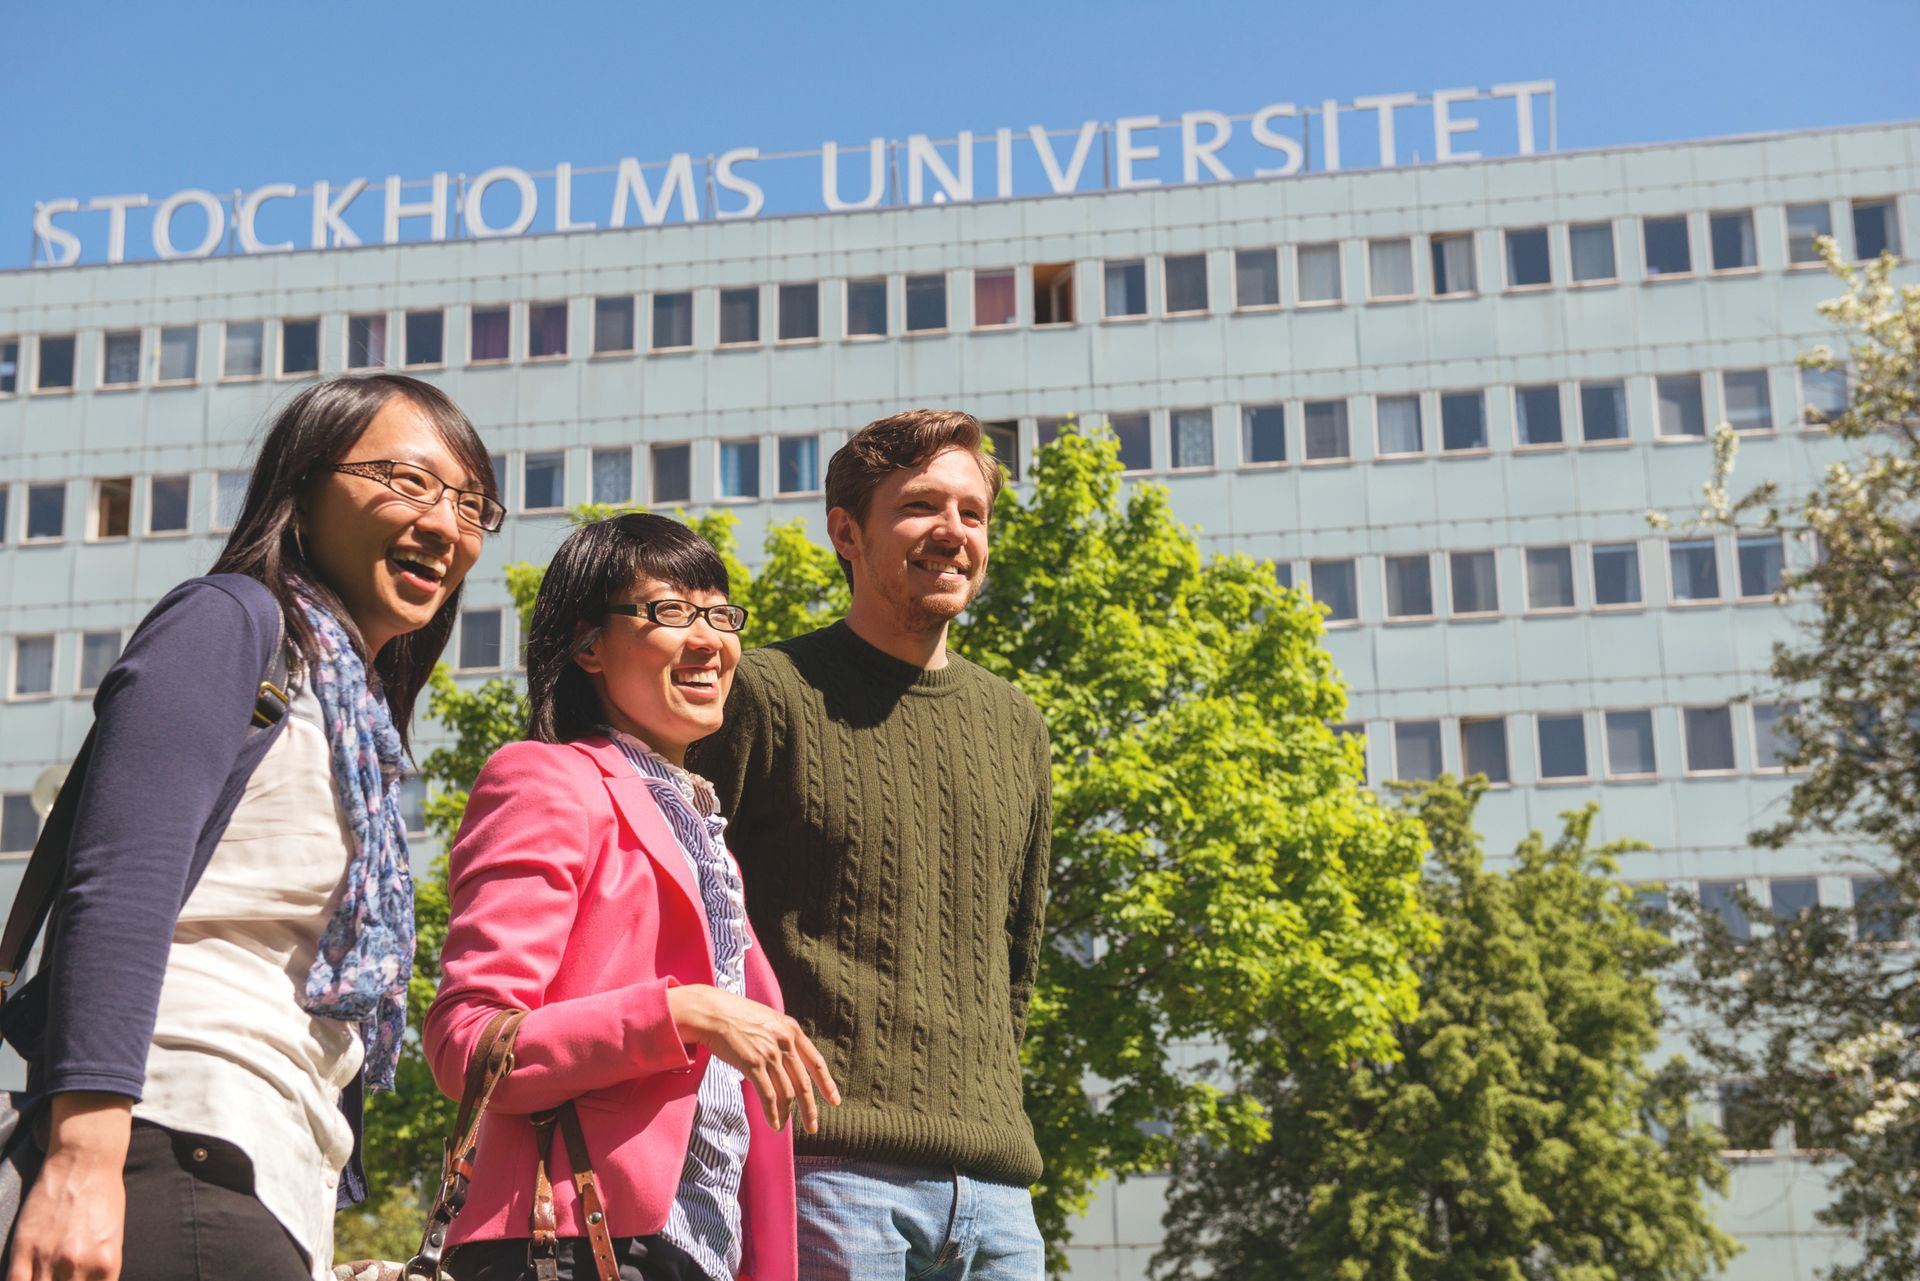 Scholars outside of Stockholm University.